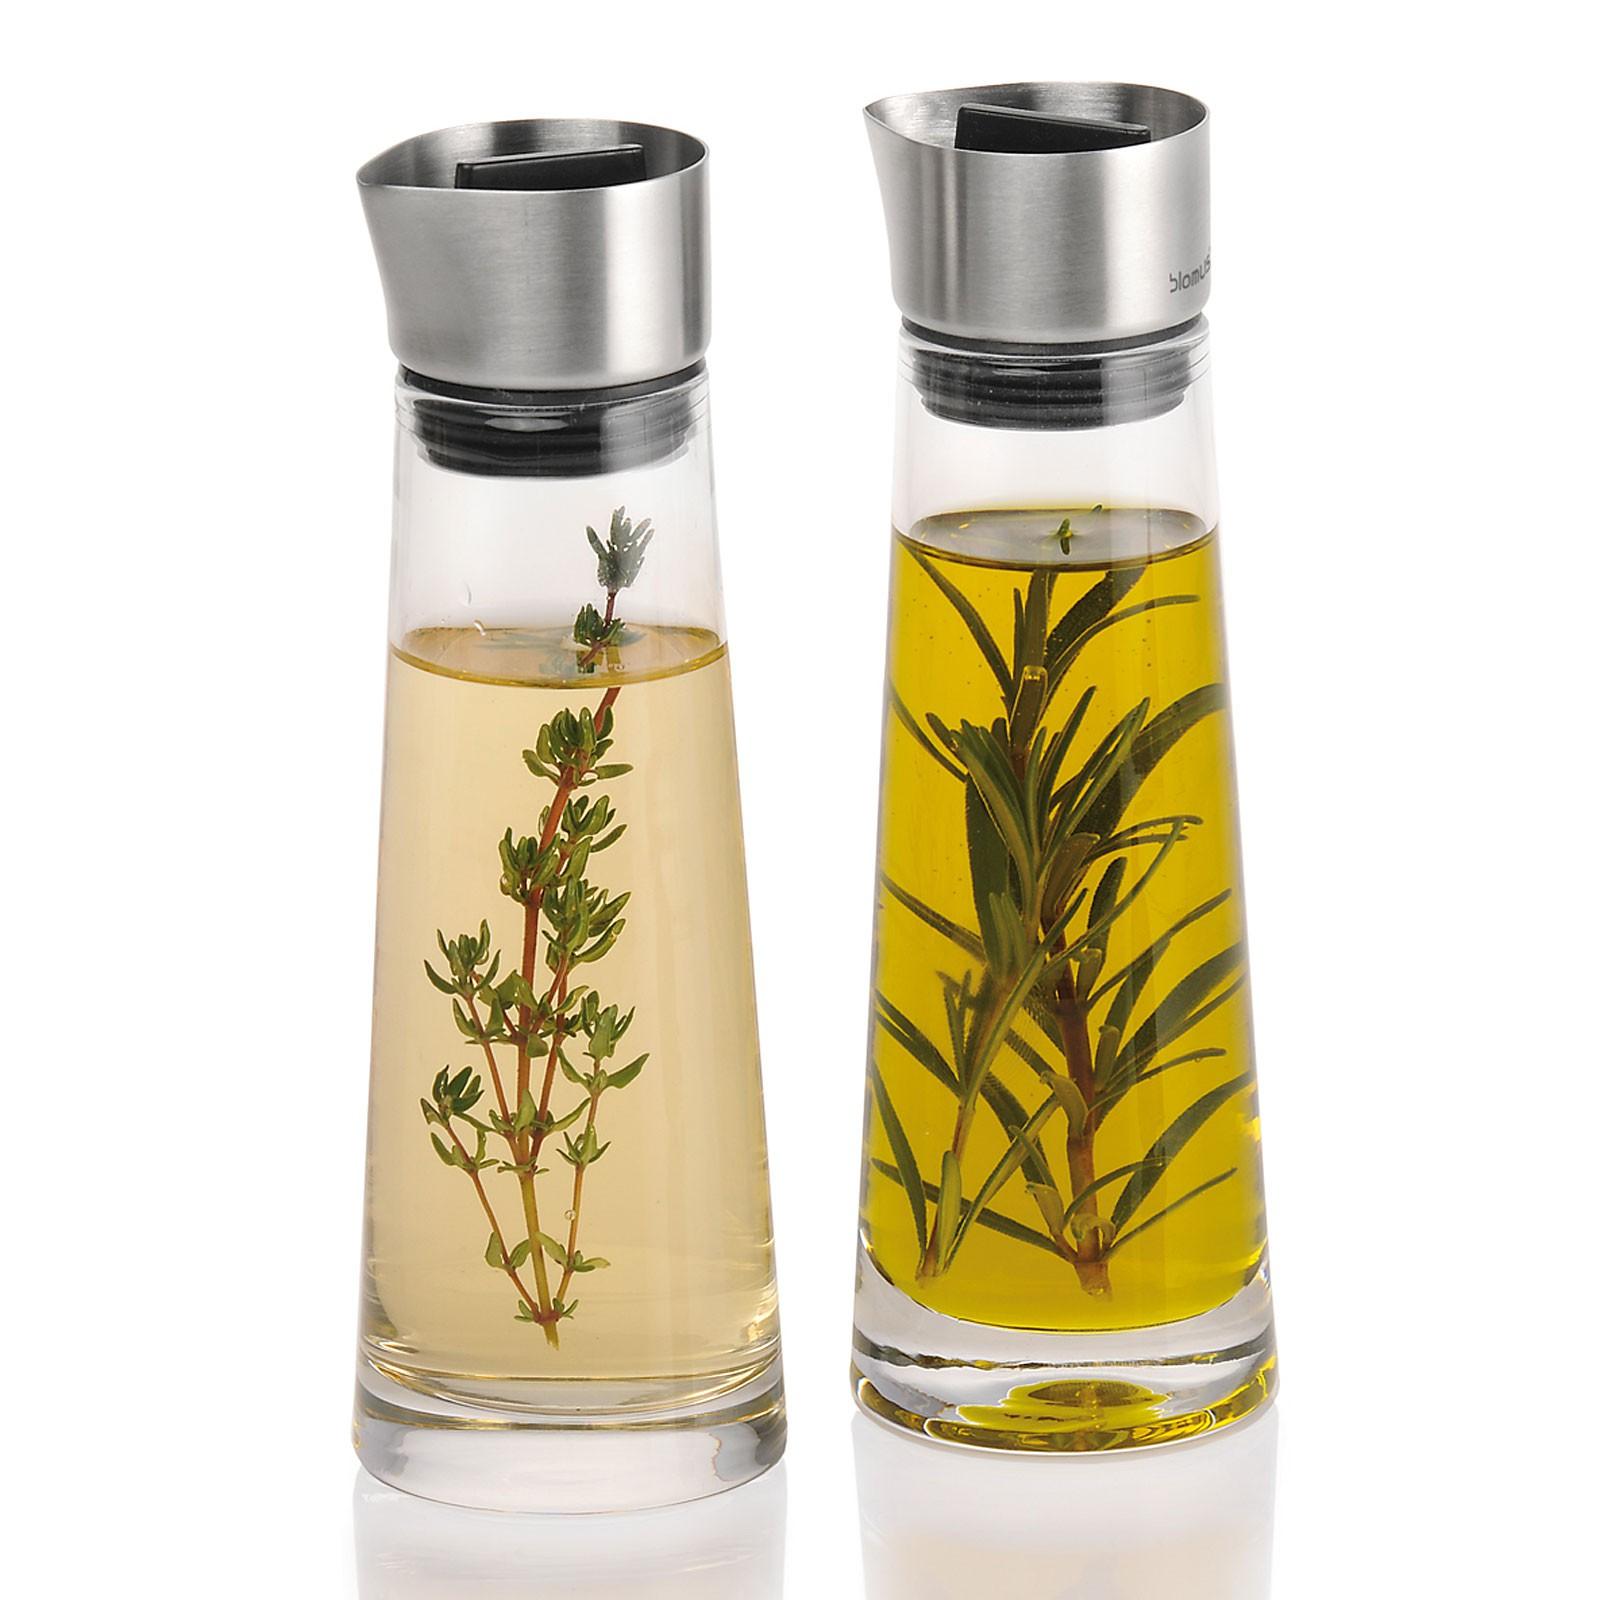 blomus Alinjo Essig + Öl Glas Set Edelstahl